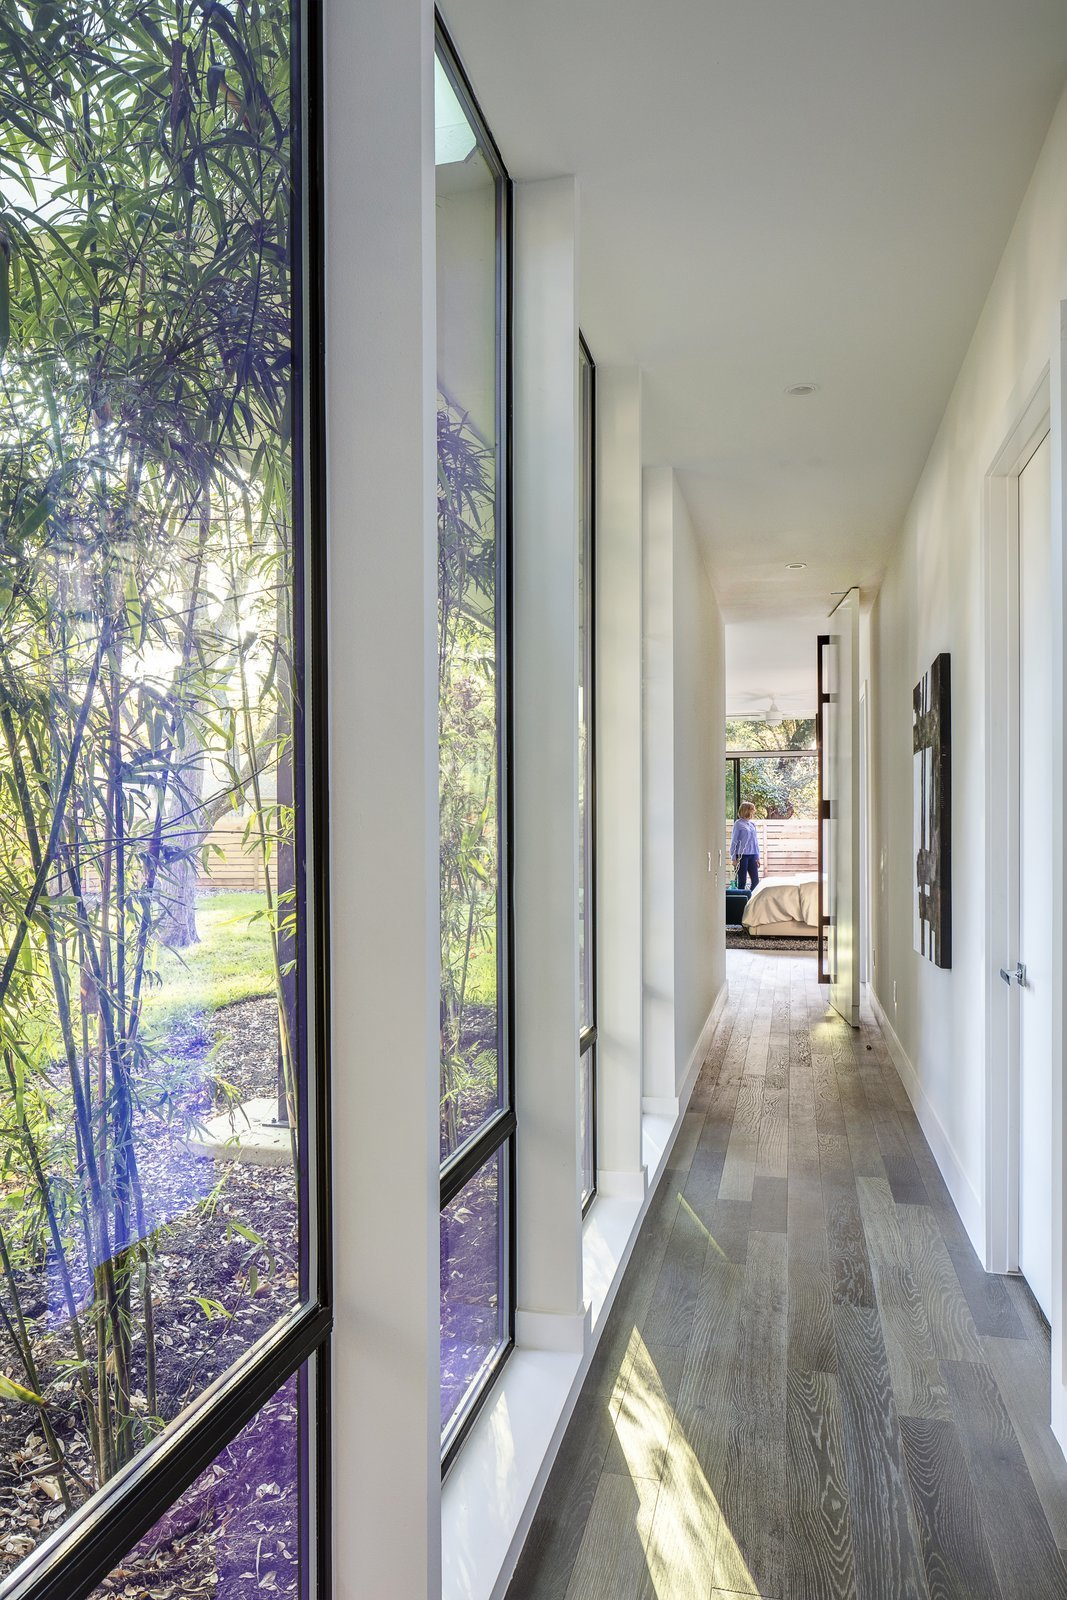 Windows, Picture Window Type, and Metal Hallway  Strass I by Sett Studio